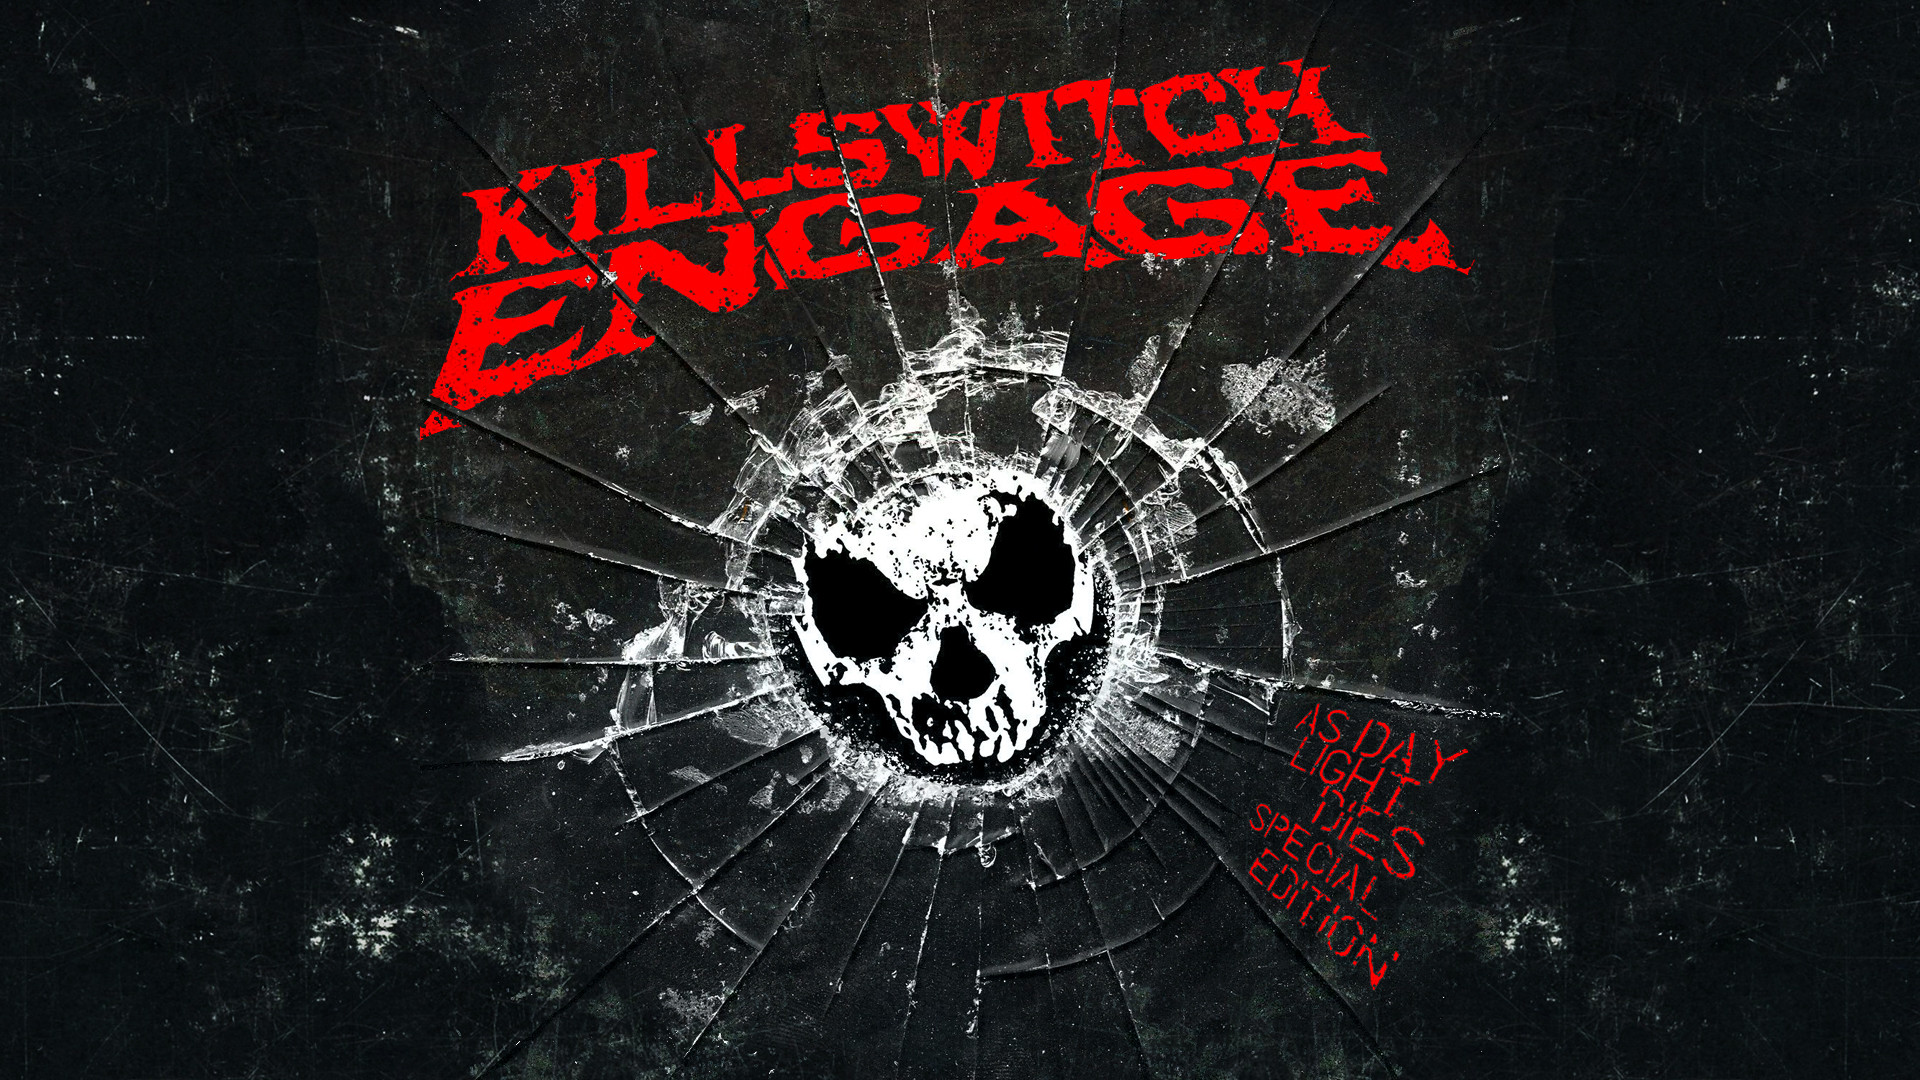 Killswitch Engage Wallpapers   Picseriocom 1920x1080